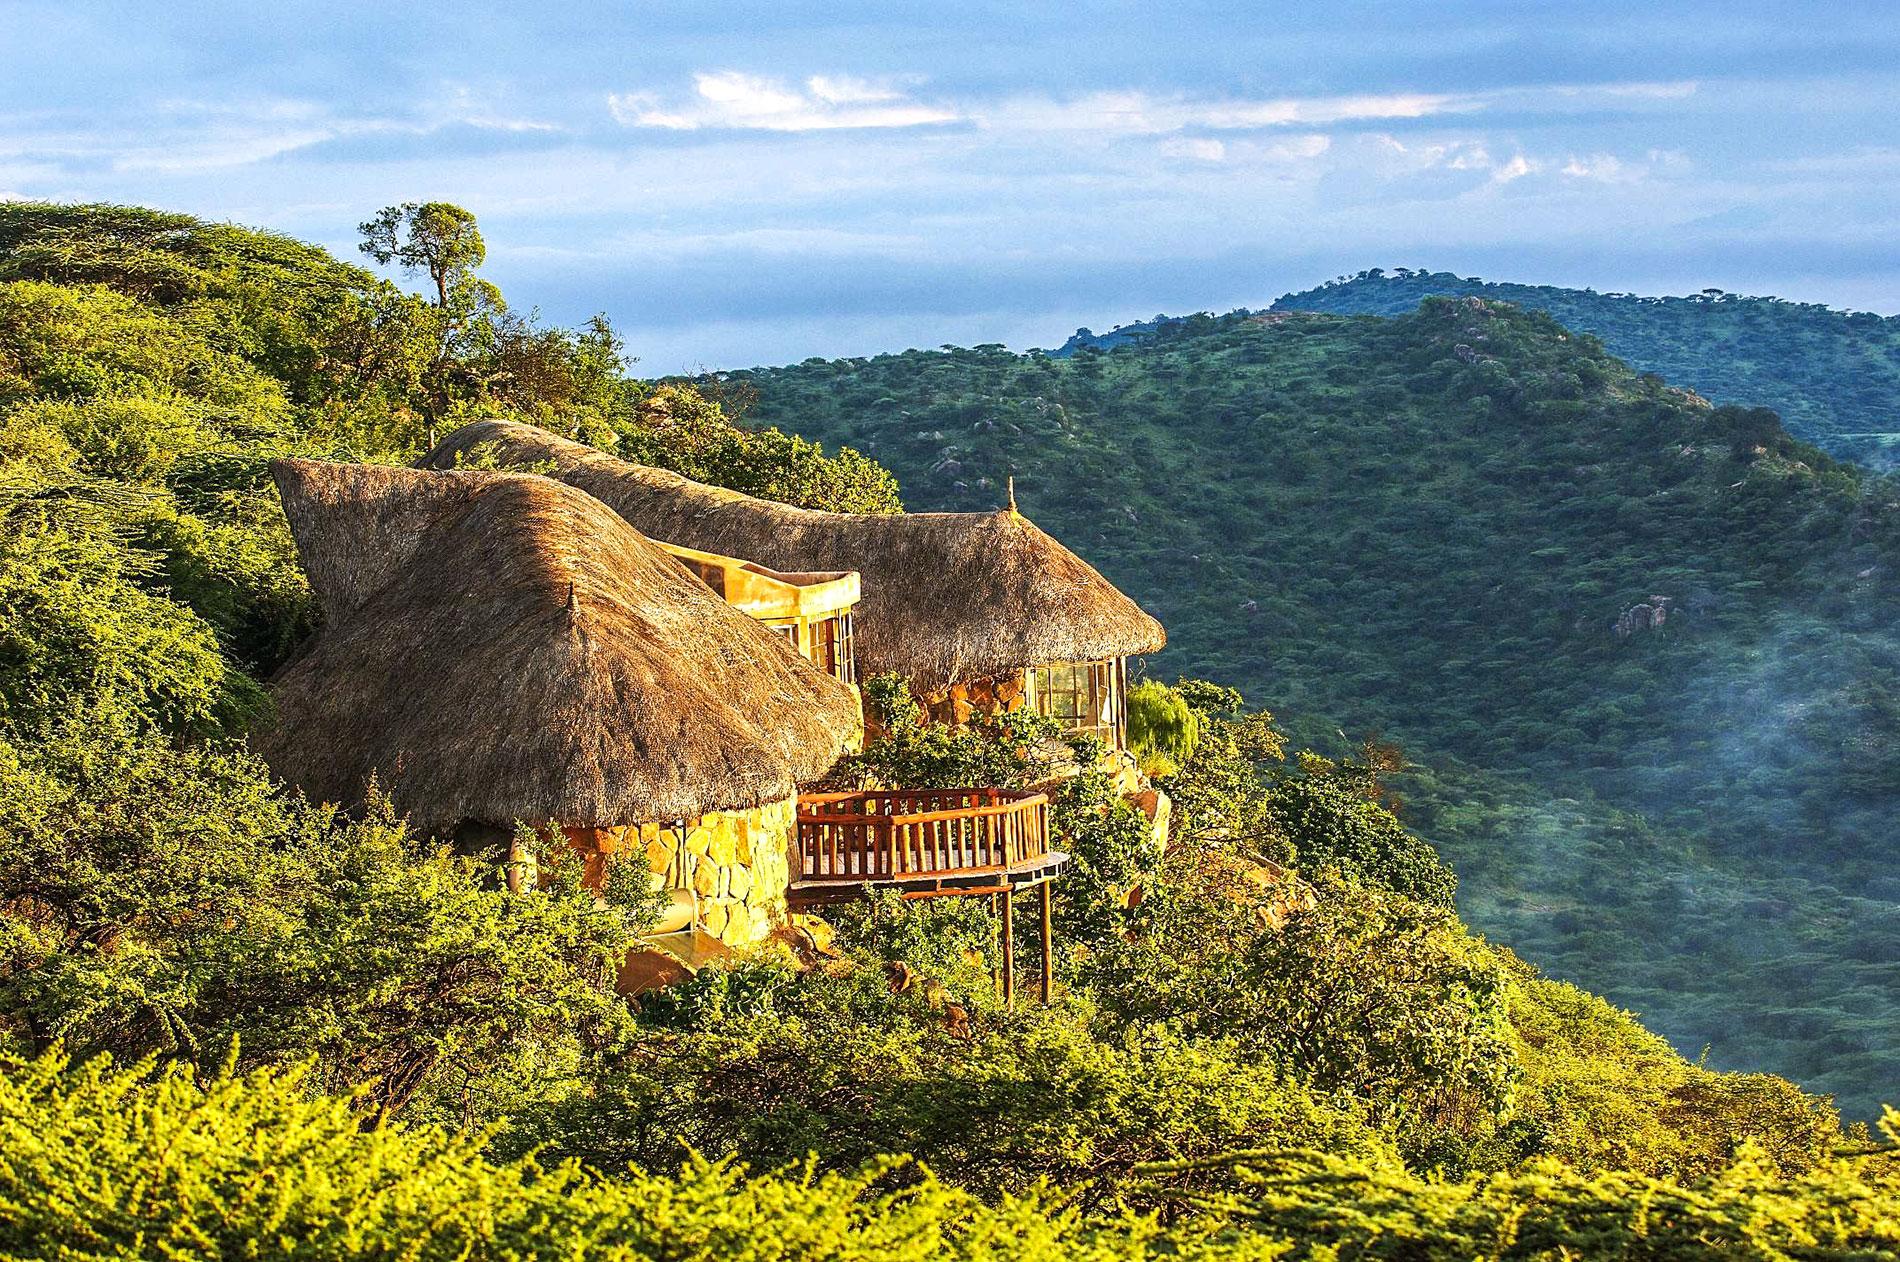 The Sultan's House - The Sanctuary at Ol Lentille Kenya